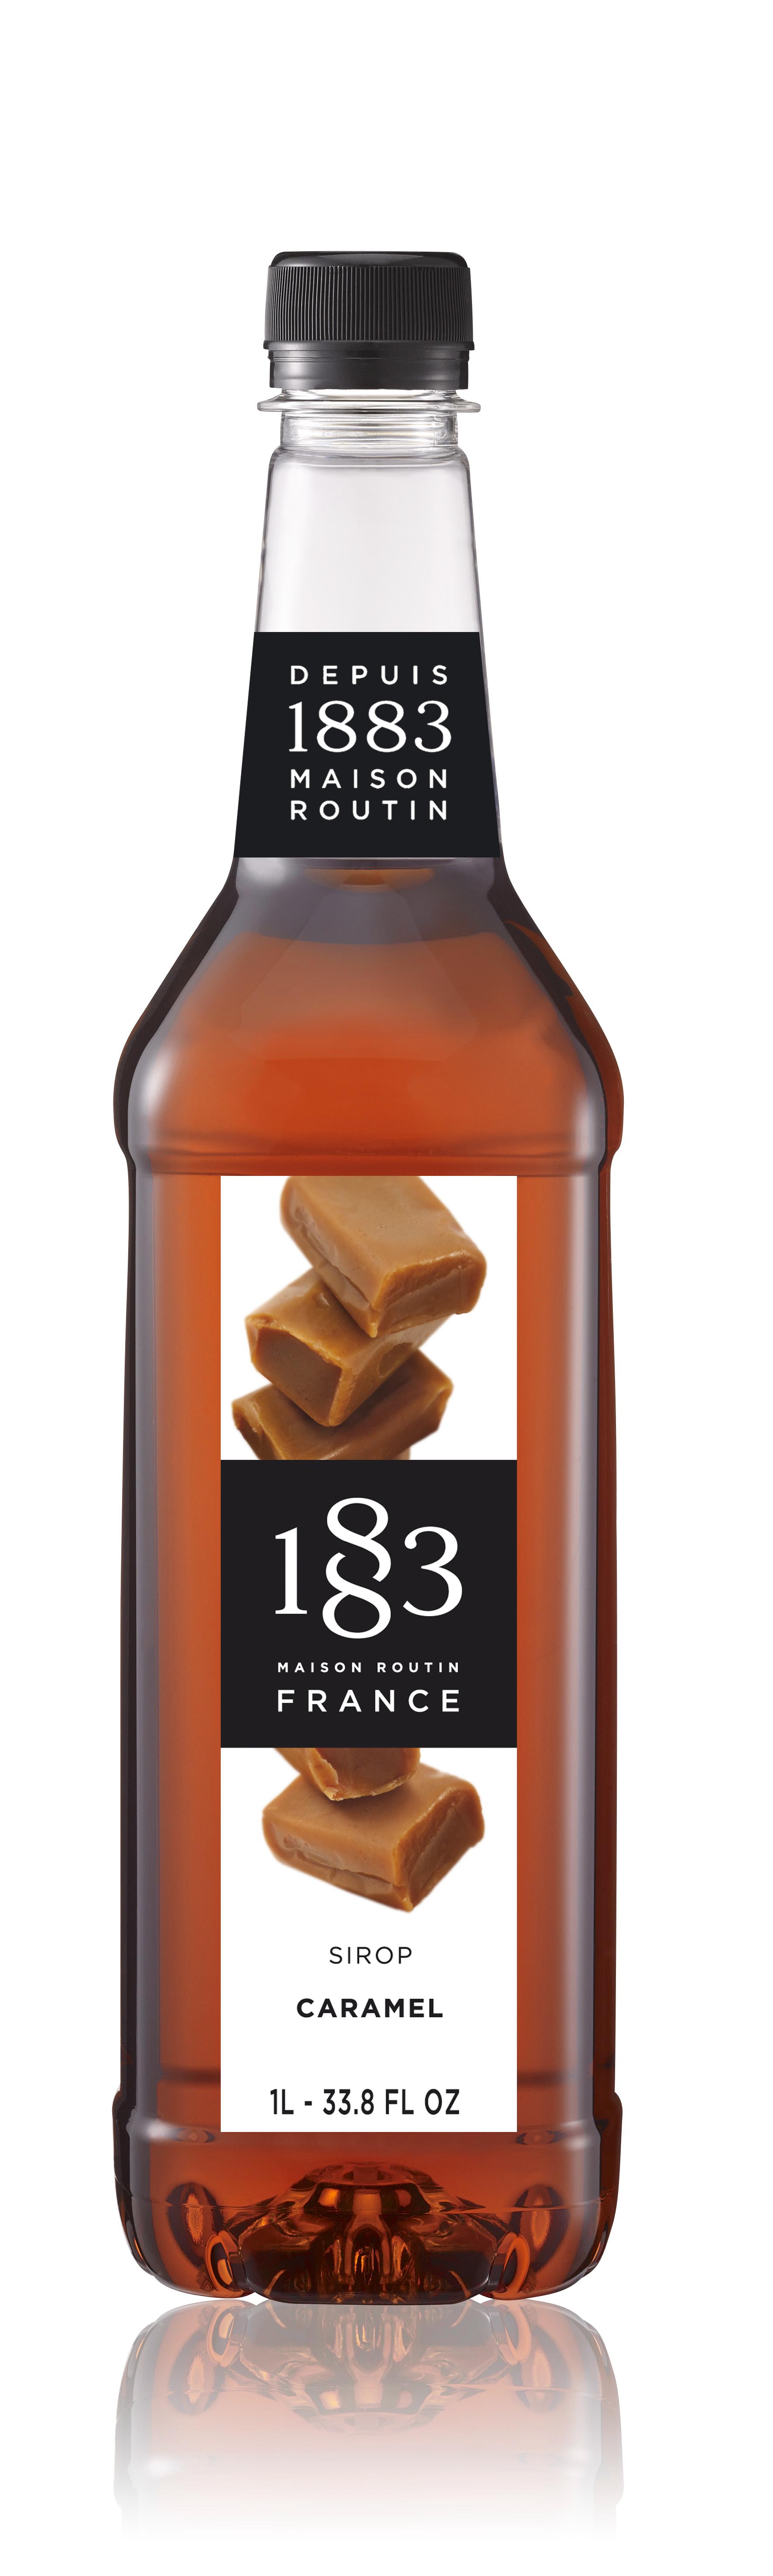 1883 Syrup Caramel 1L PET Plastic Bottle